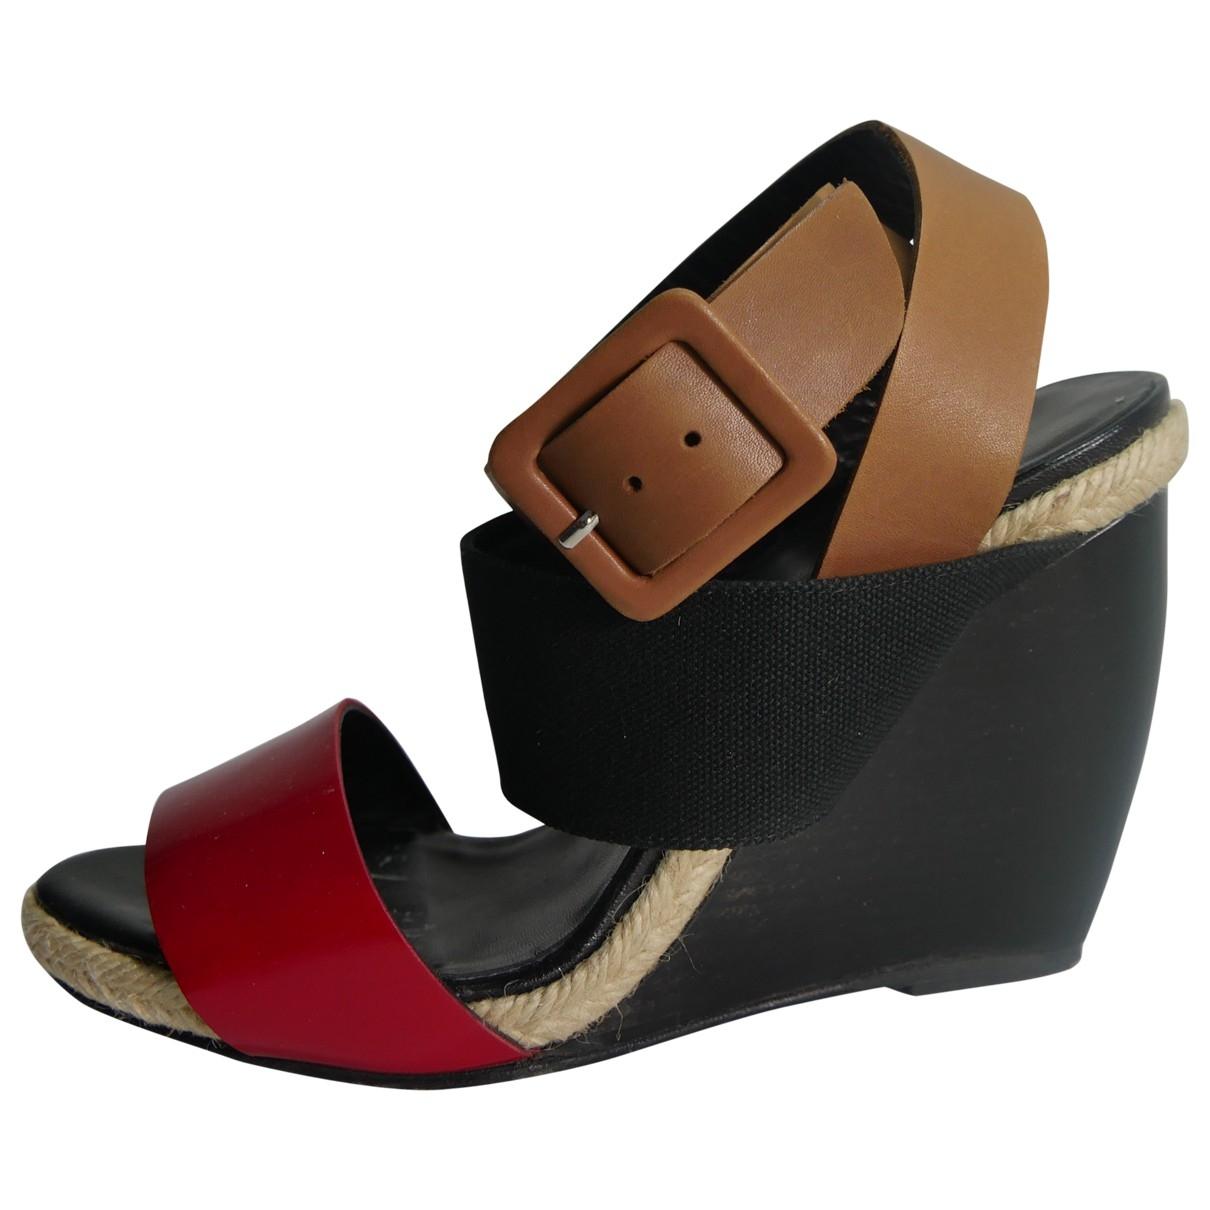 Pierre Hardy \N Multicolour Leather Sandals for Women 36 EU